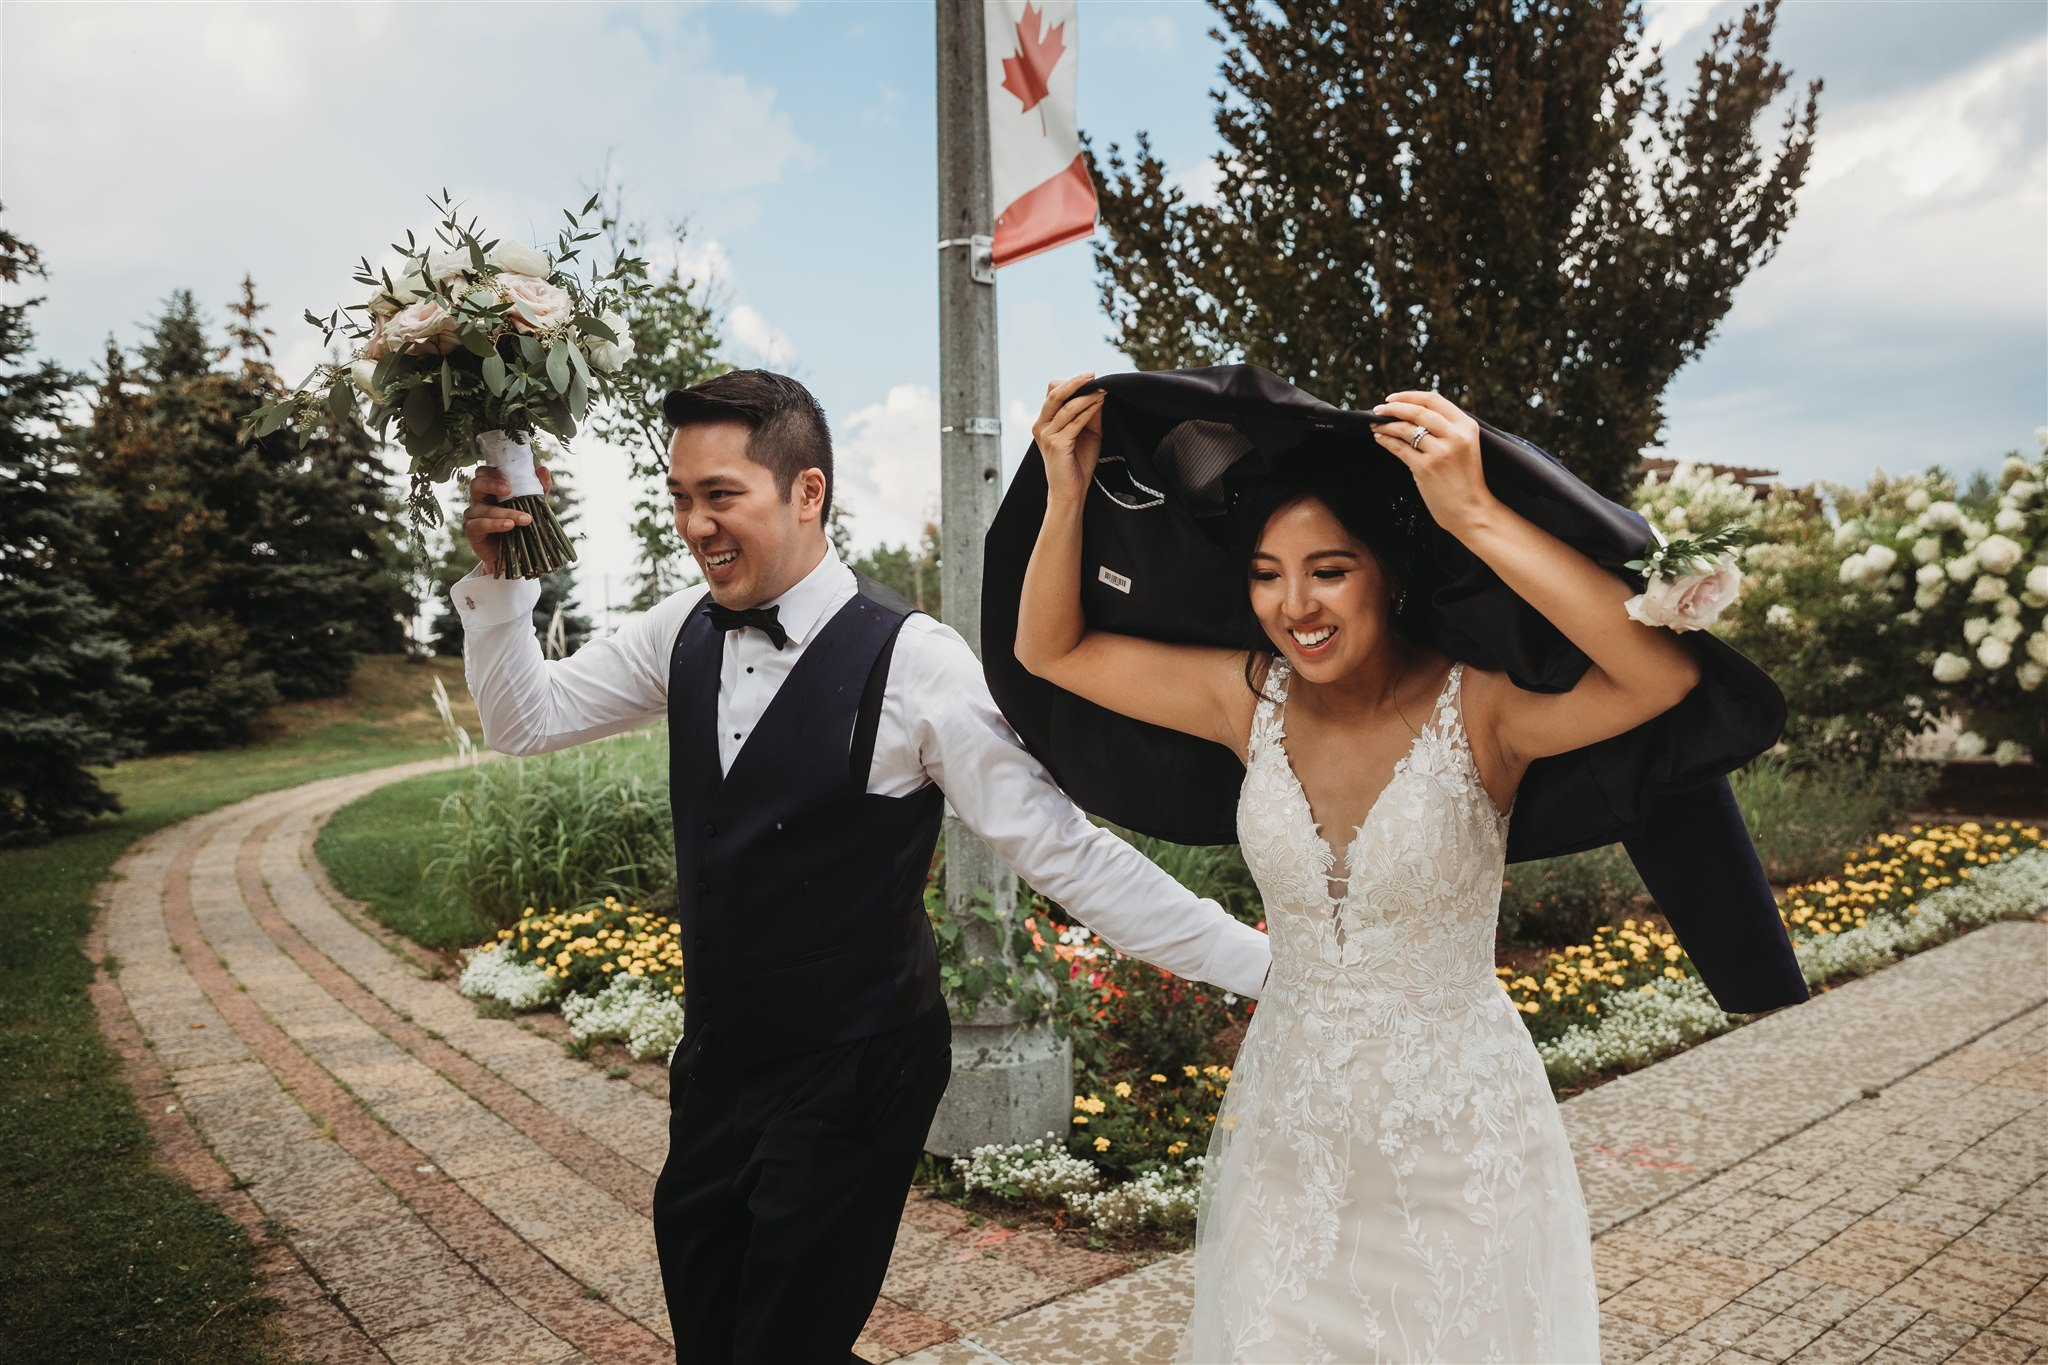 Richmond Green wedding photos, rainy wedding photos